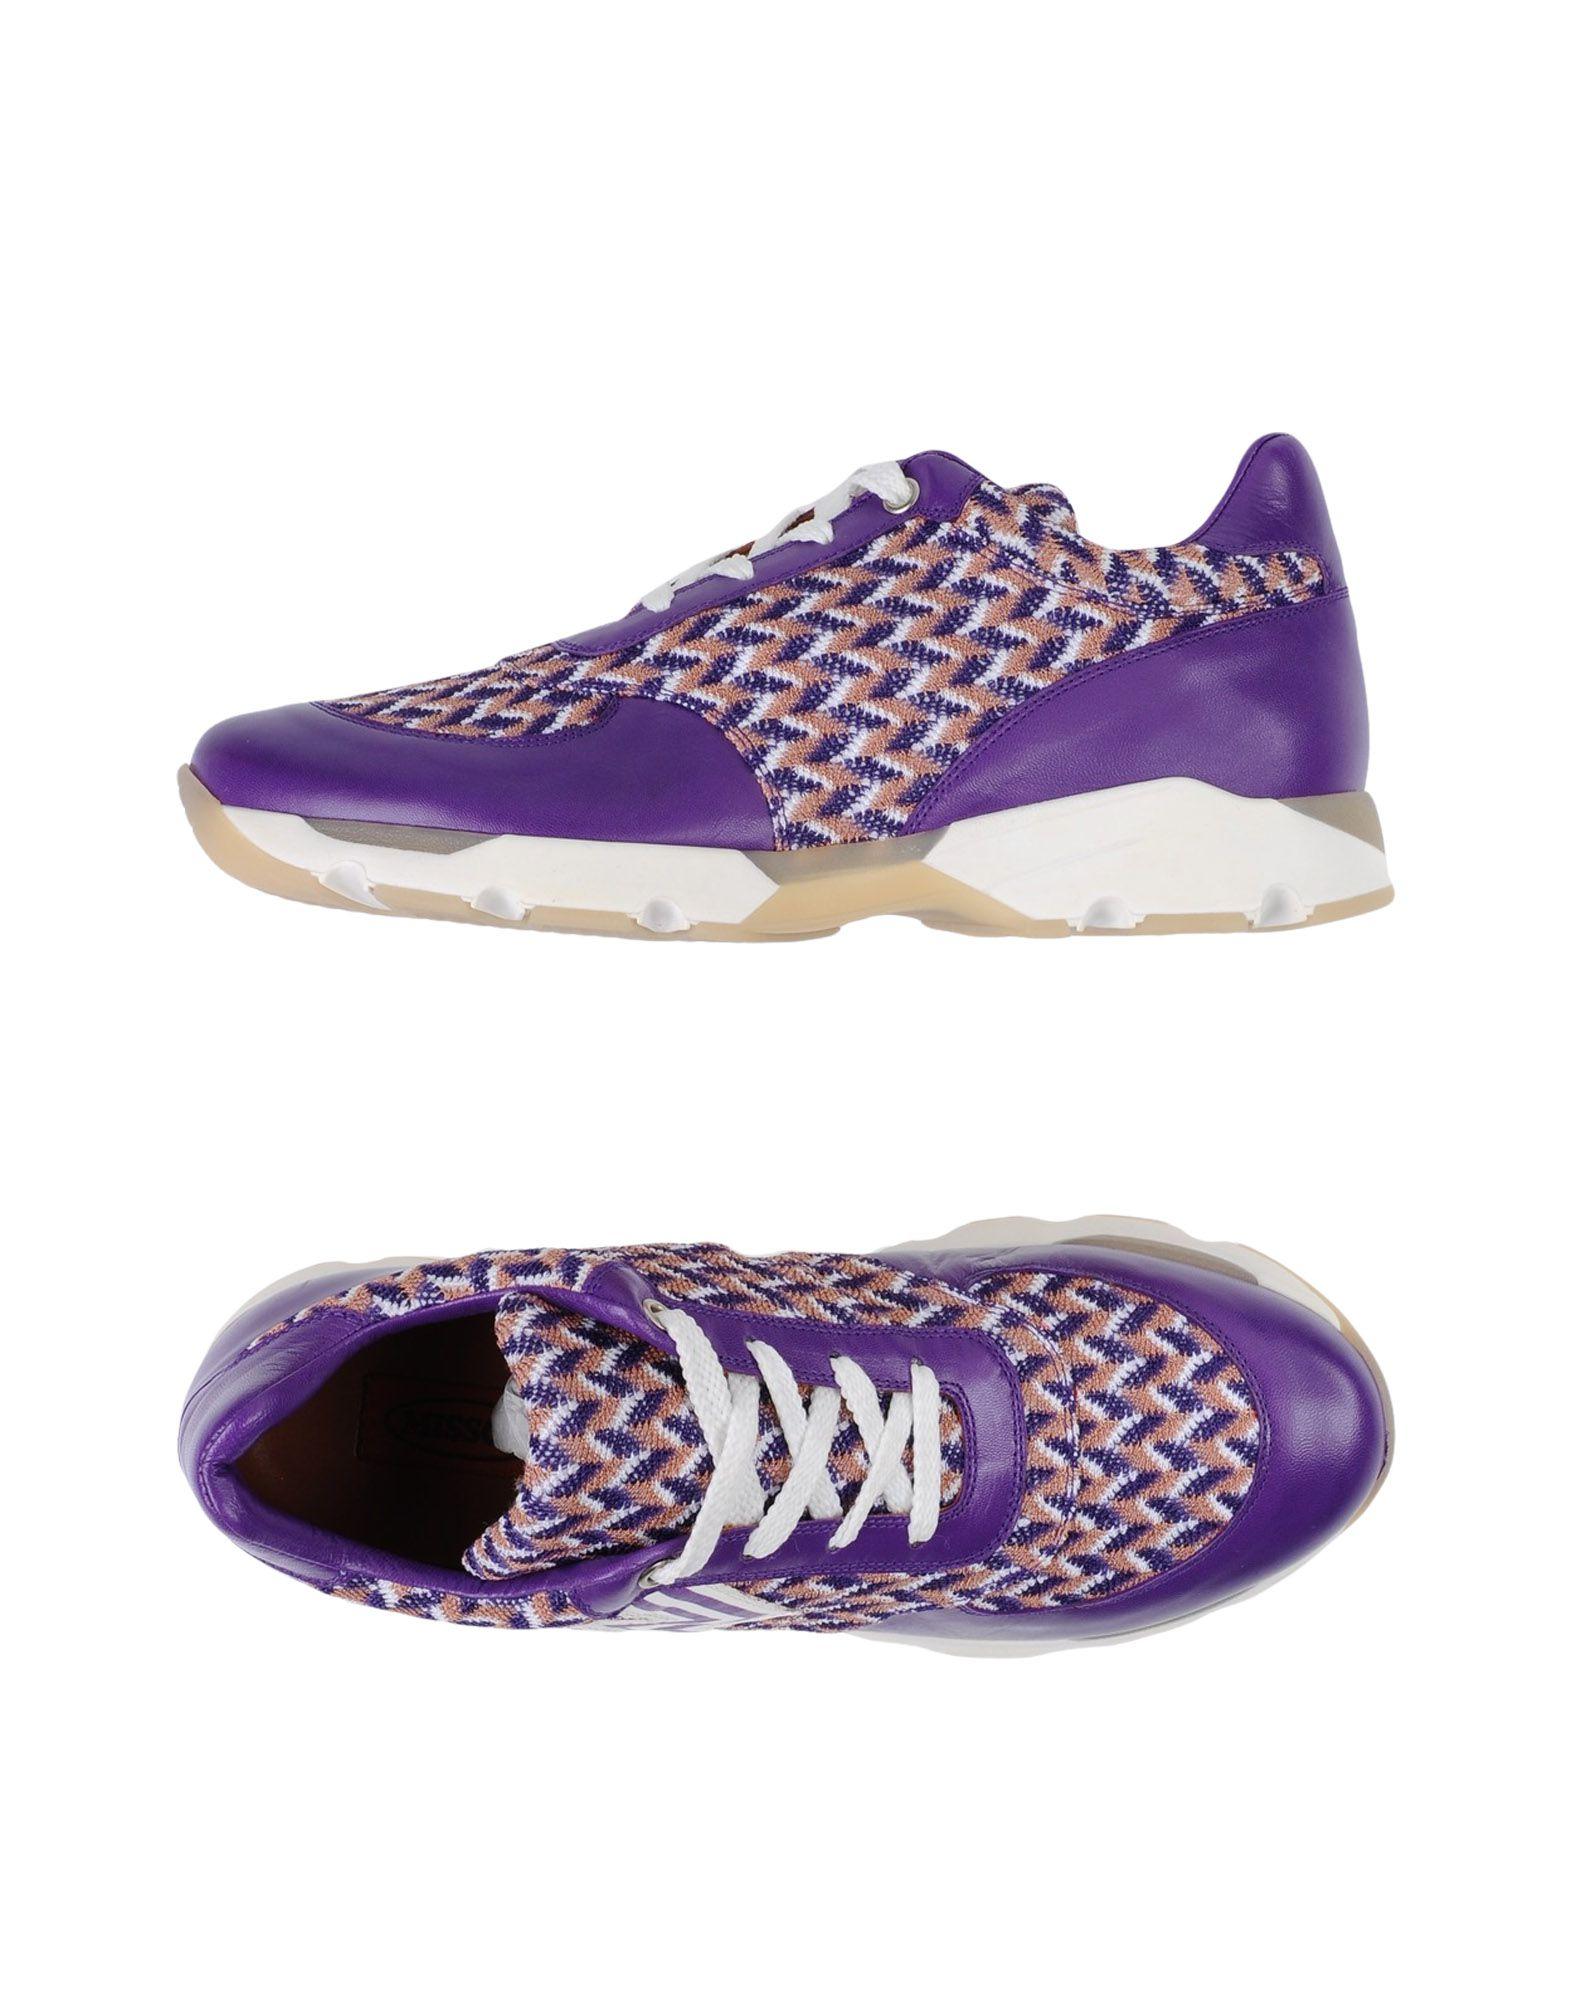 Missoni Sneakers - Women Missoni Sneakers online 11339908BR on  Canada - 11339908BR online d83fd8